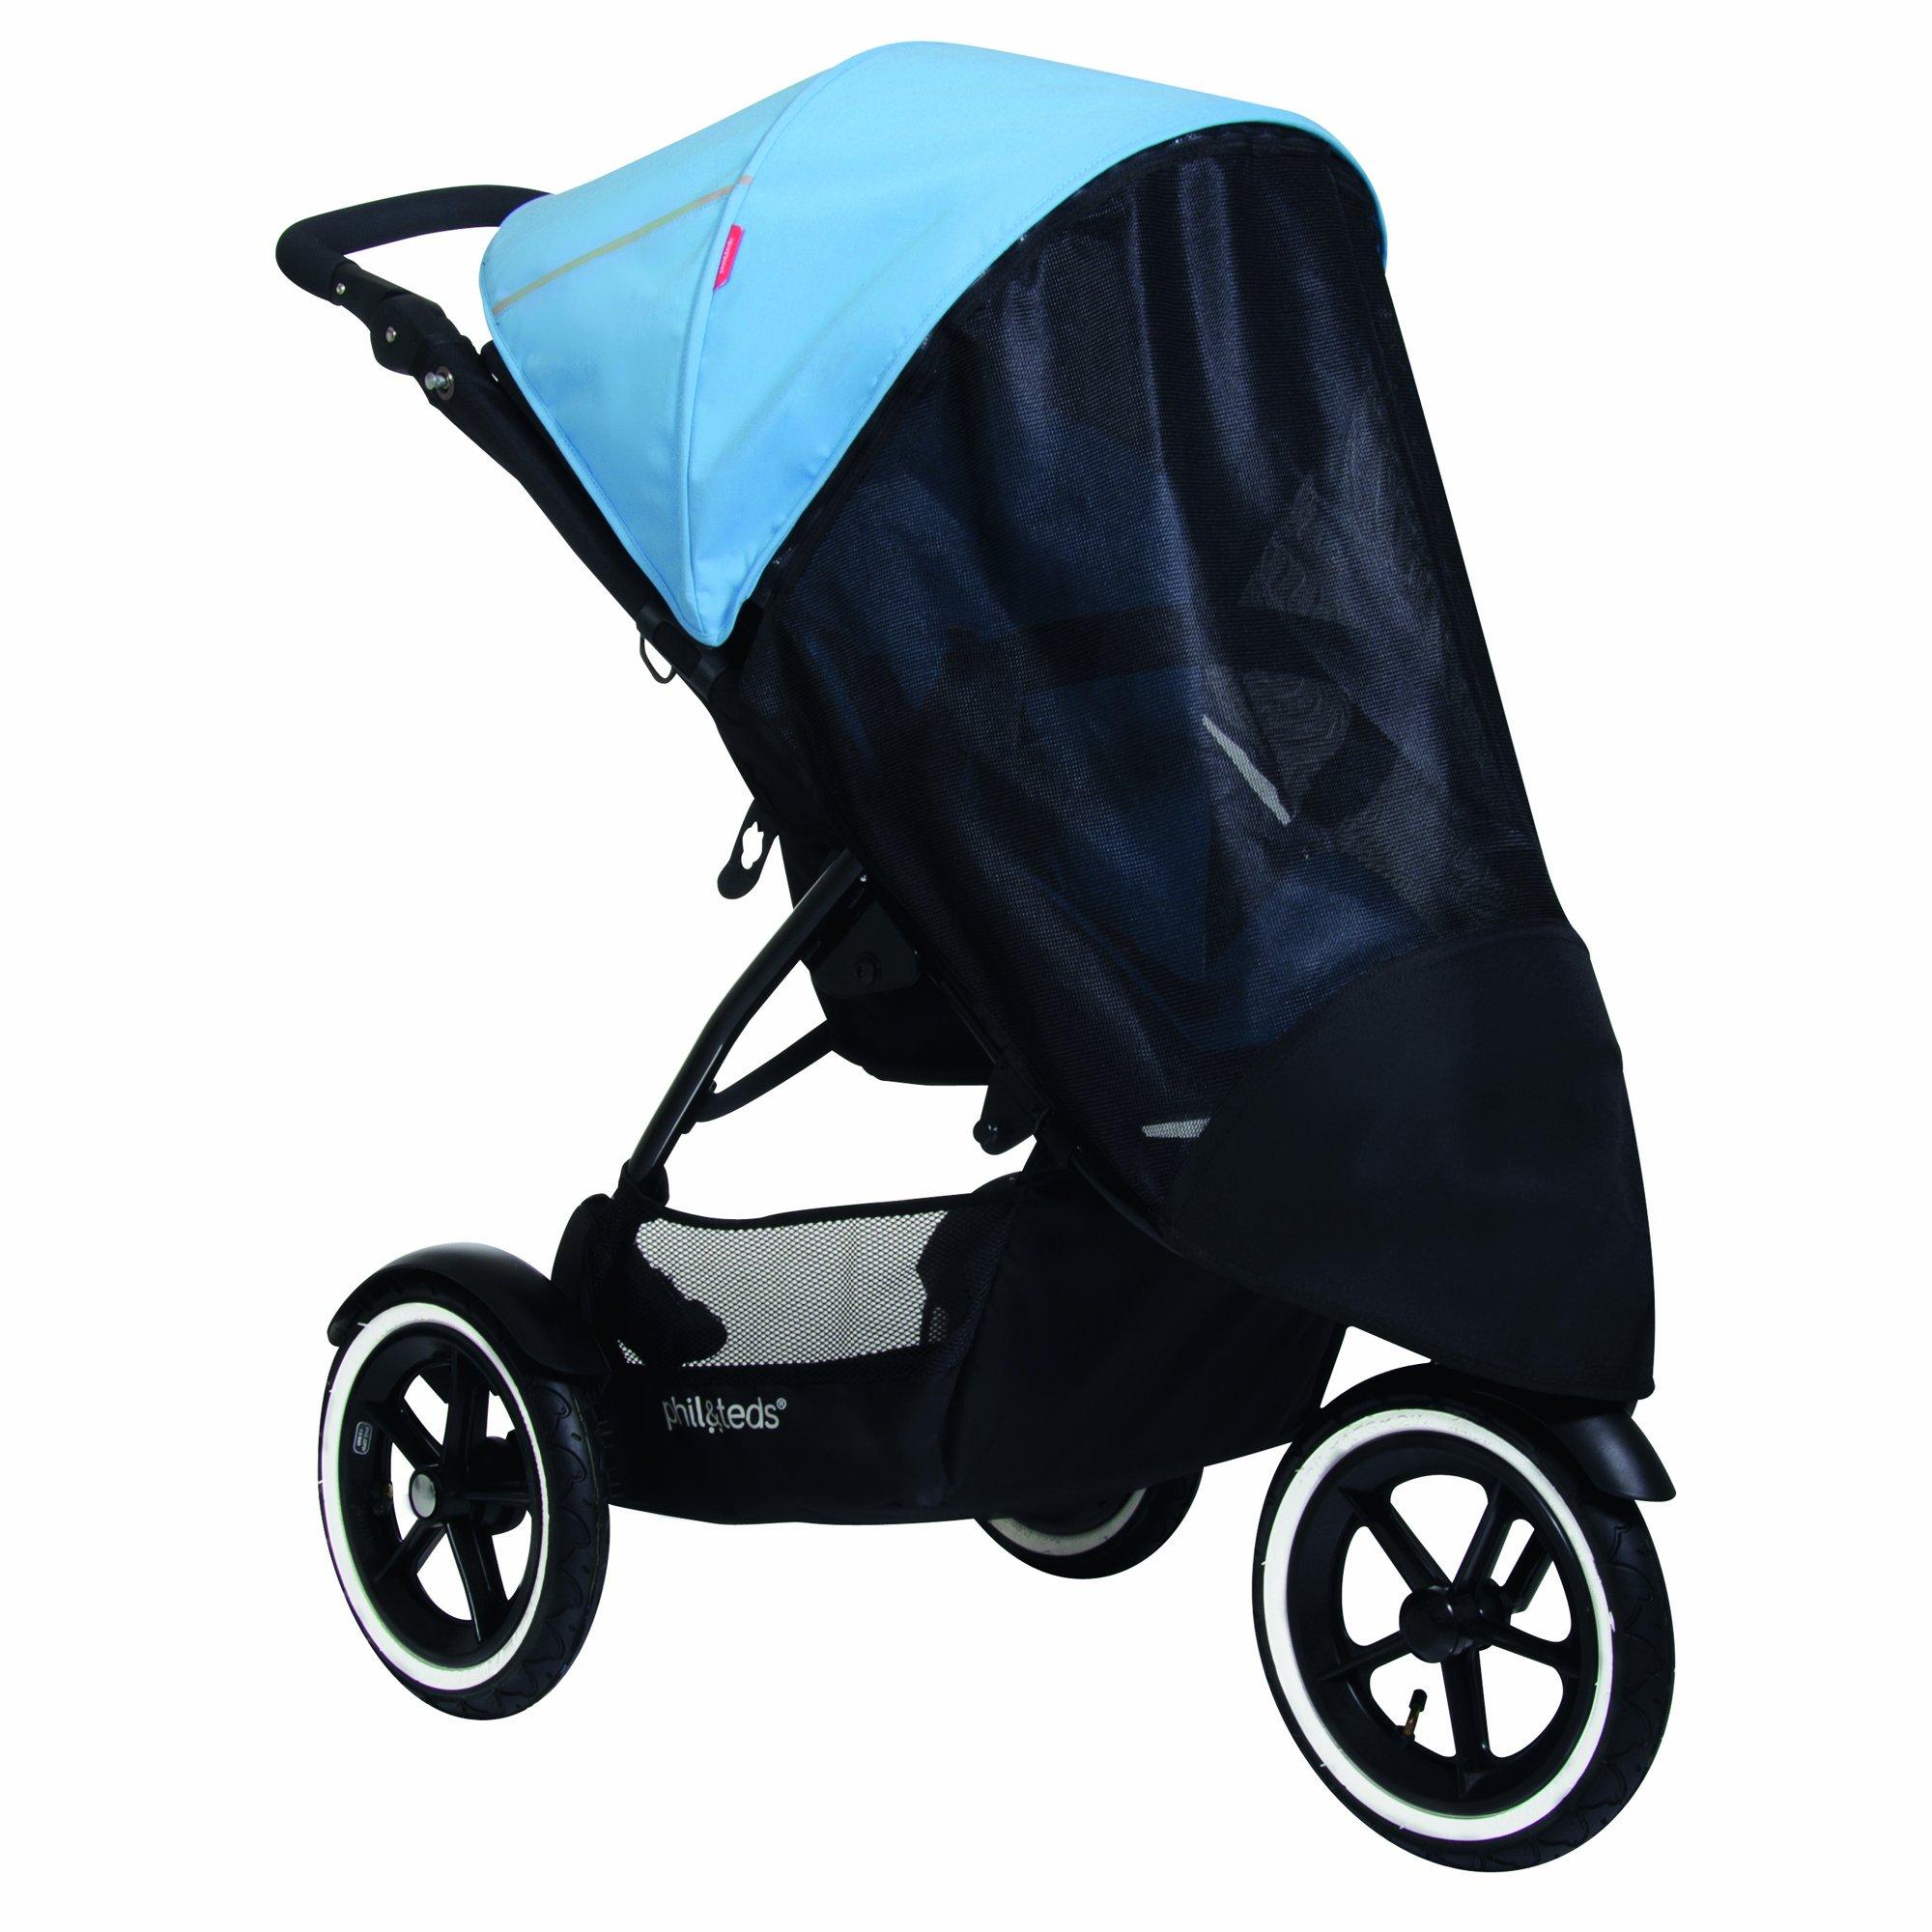 phil&teds UV Sunny Days Mesh Cover for Single Navigator Stroller, Black by phil&teds